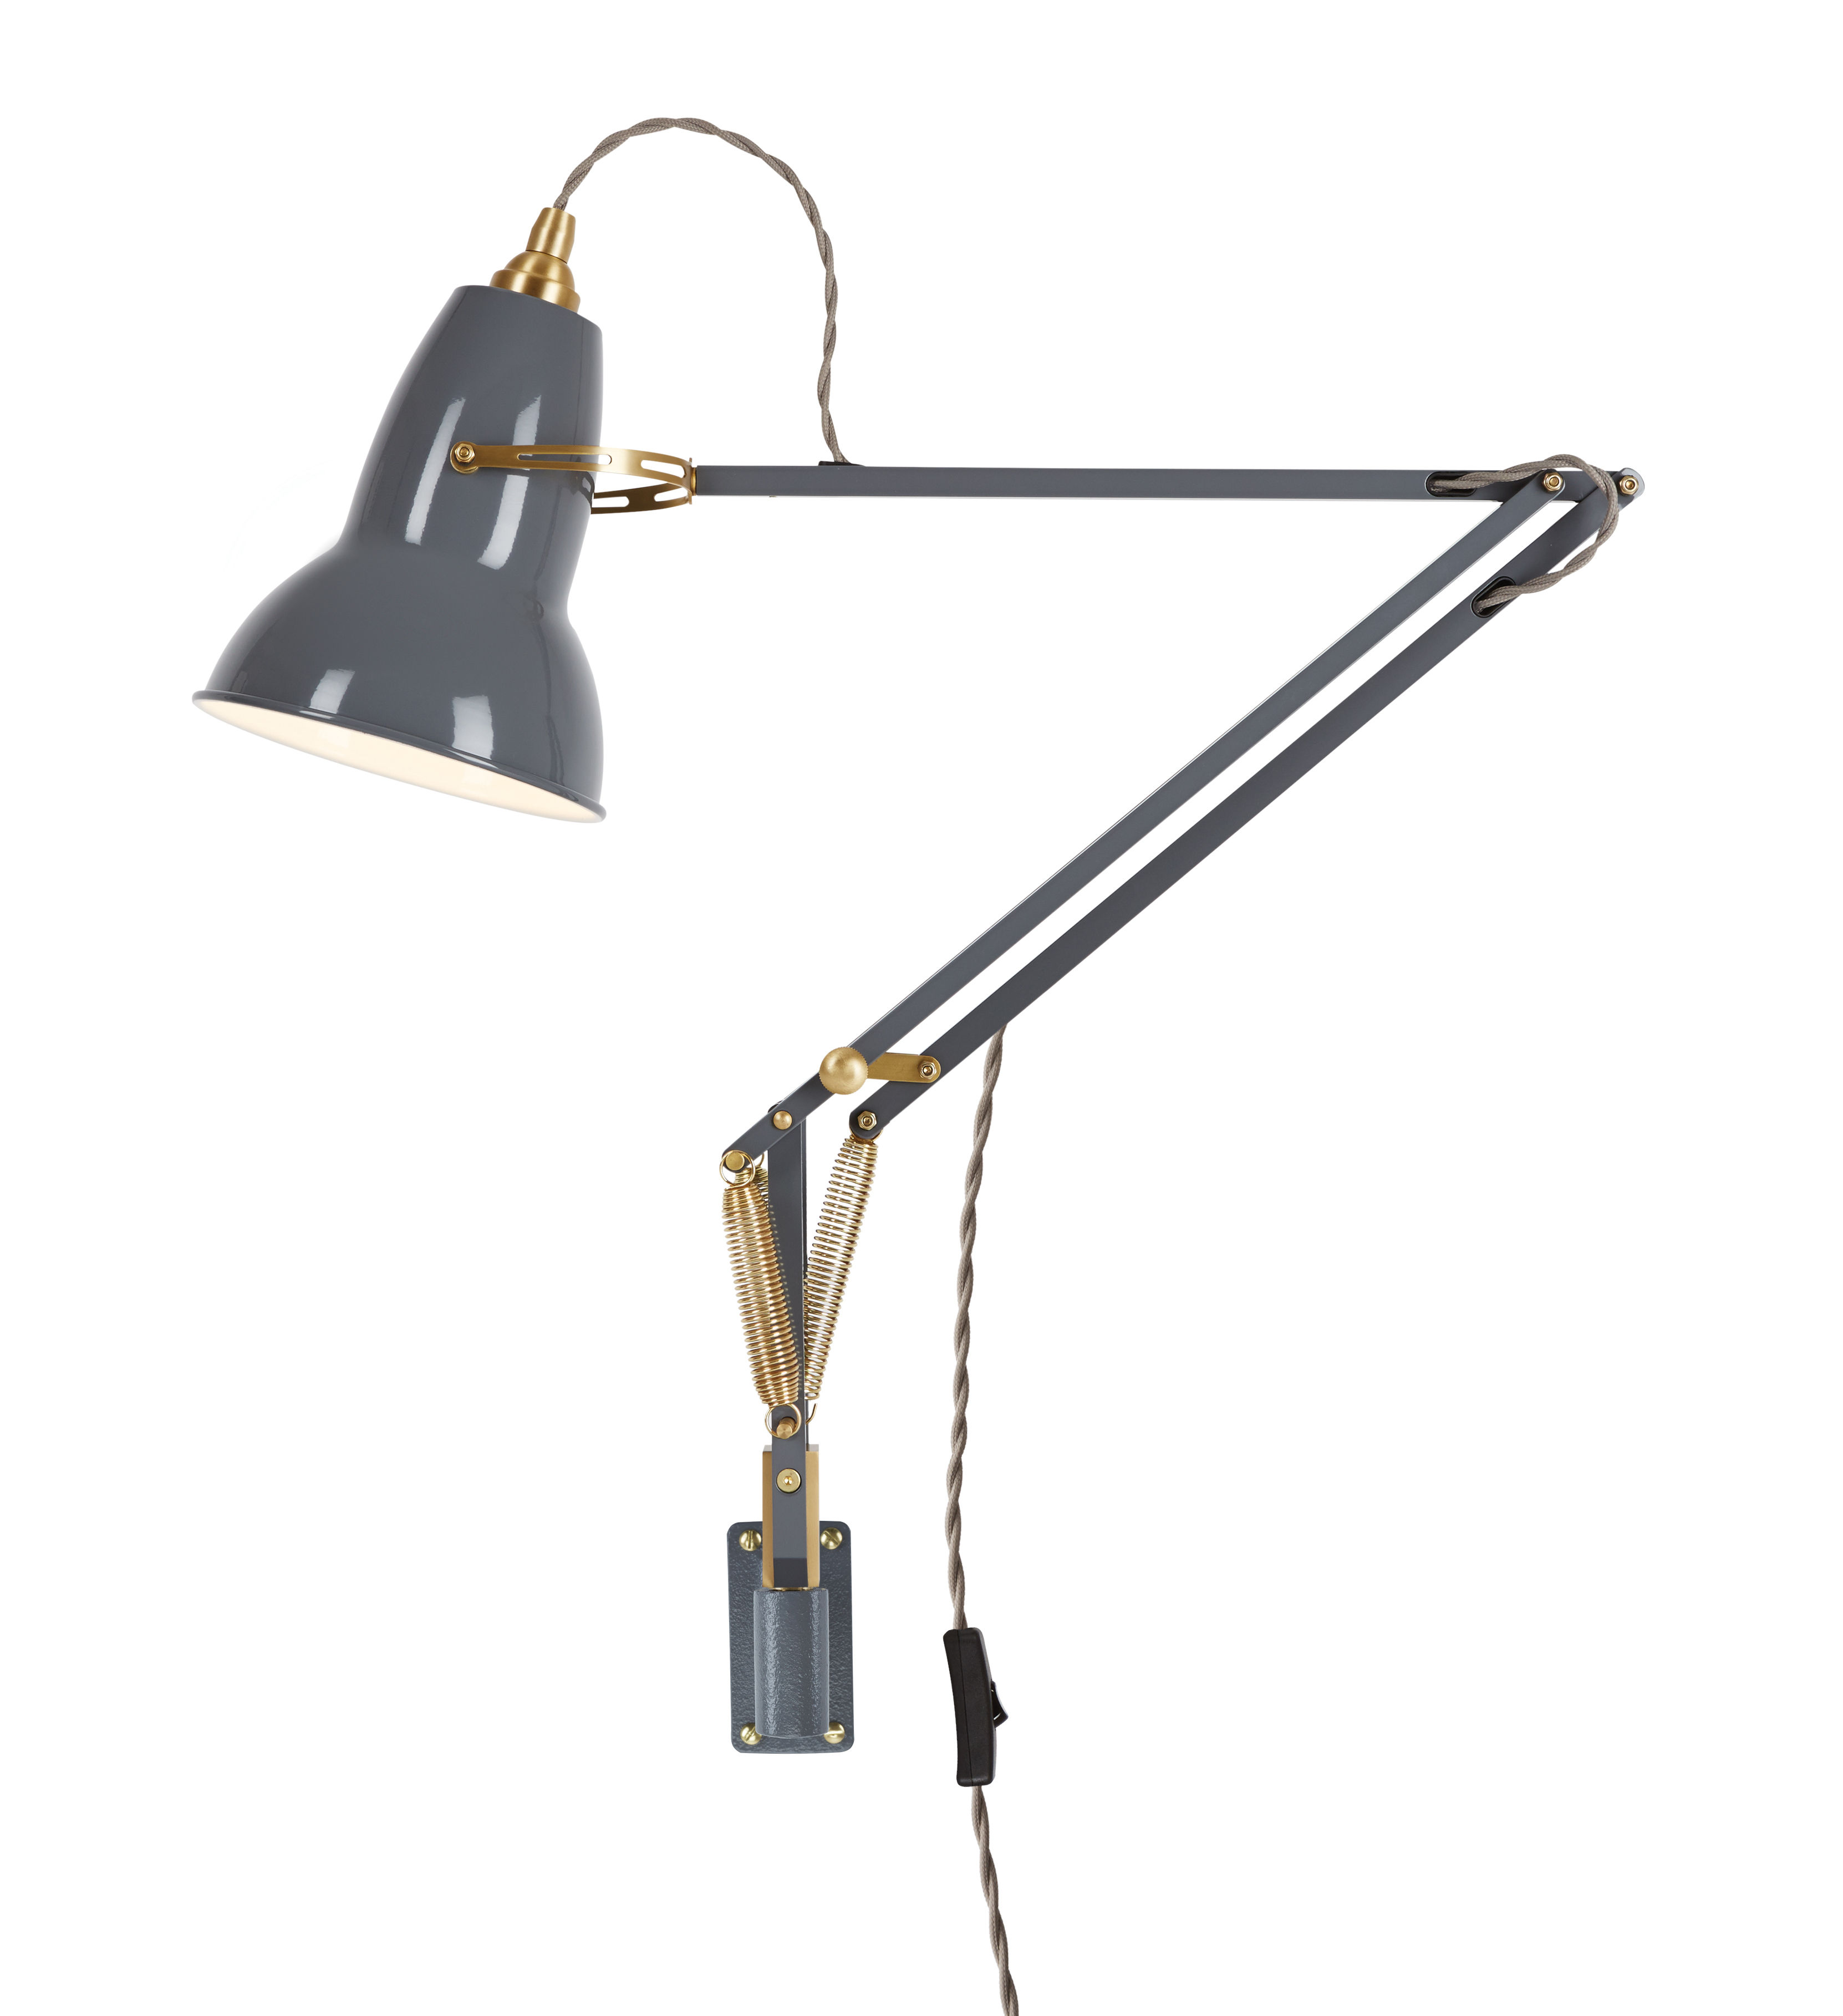 applique original 1227 laiton bras articul gris l phant anglepoise. Black Bedroom Furniture Sets. Home Design Ideas